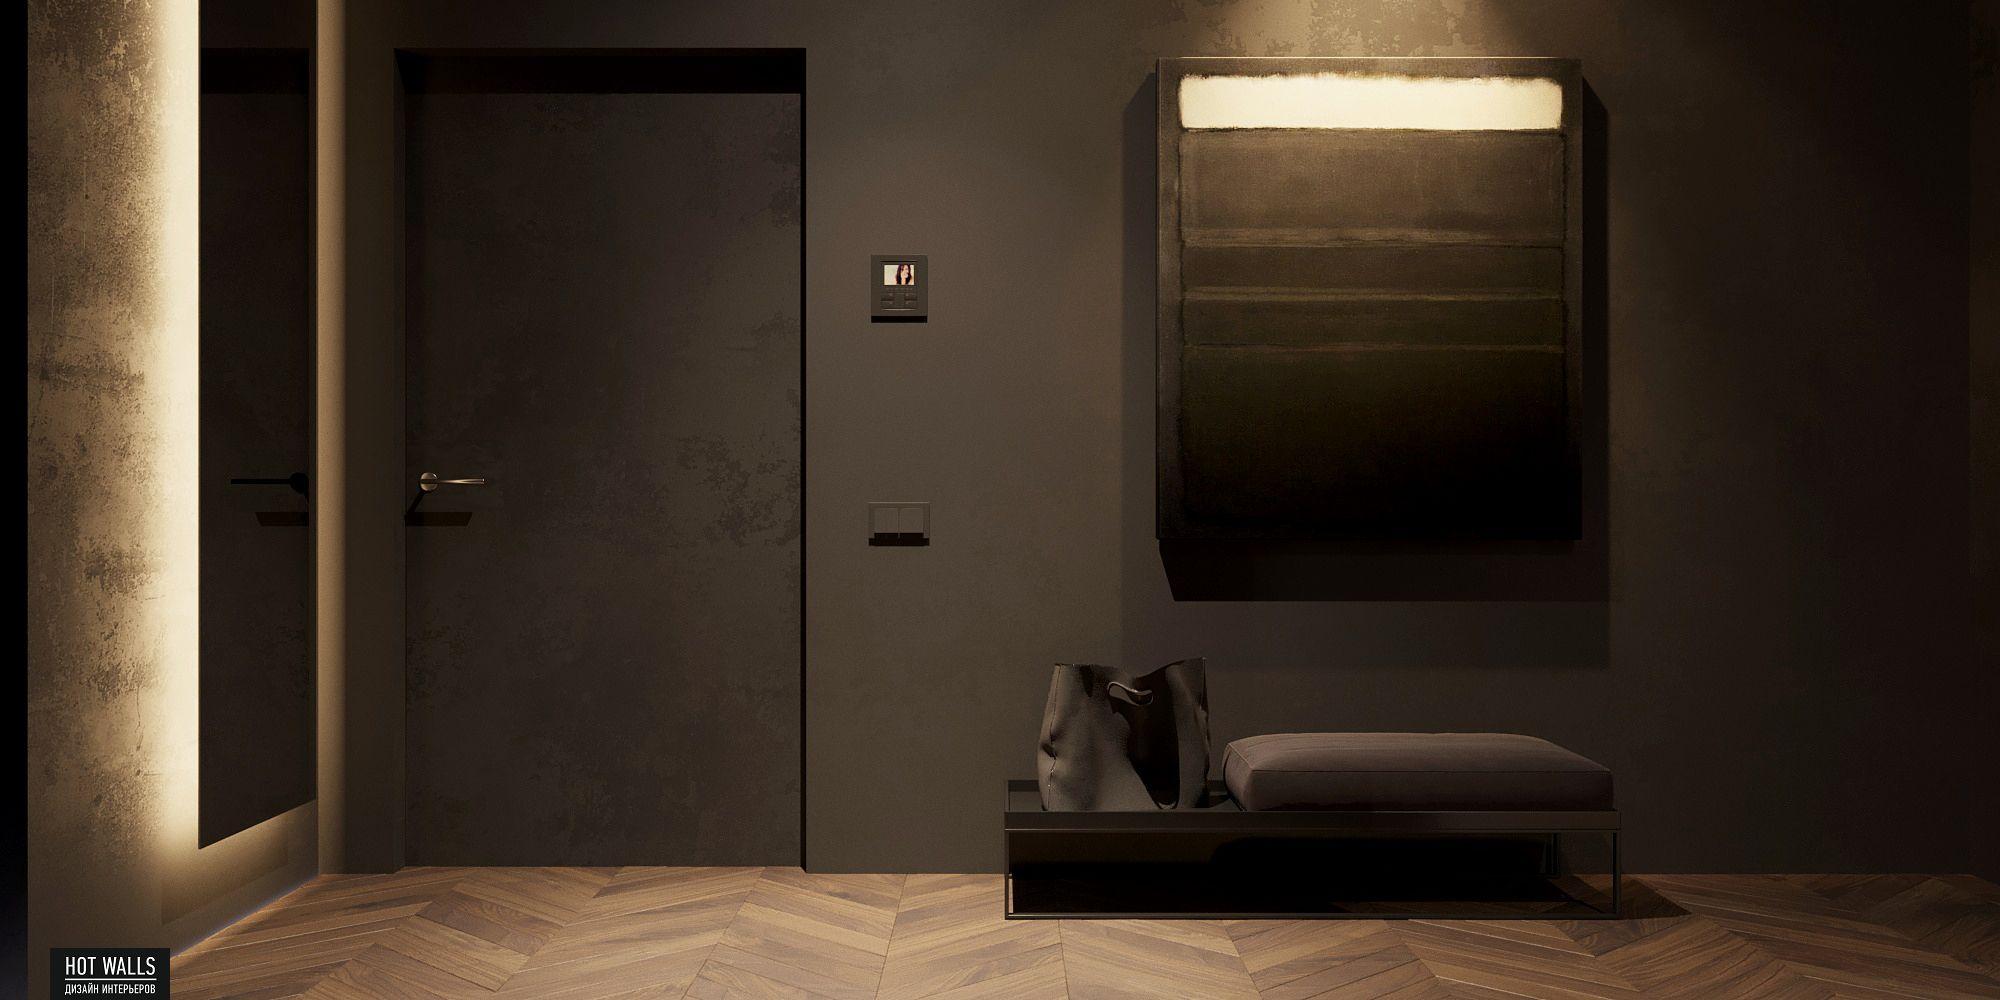 Hallway_05.09.17